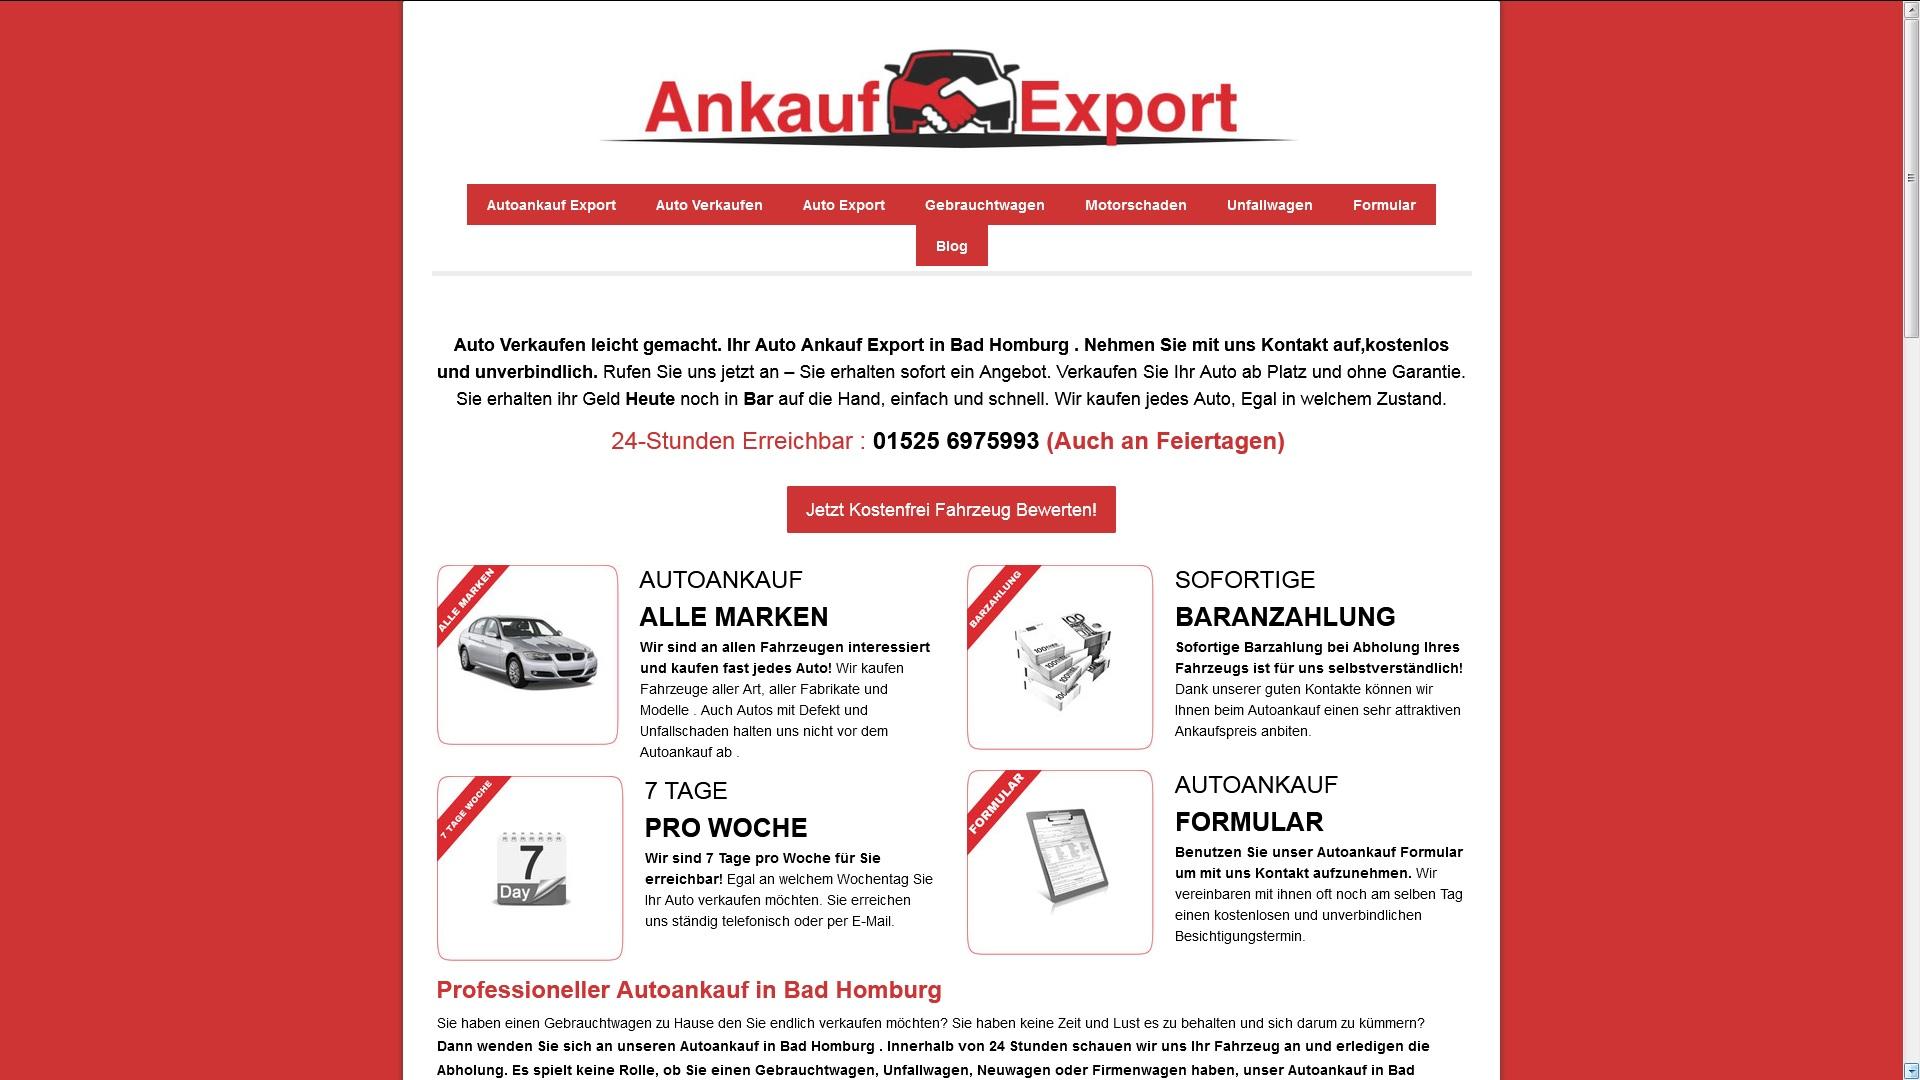 autoankauf bamberg kauft auch lkws an - Autoankauf Bamberg kauft auch LKWs an